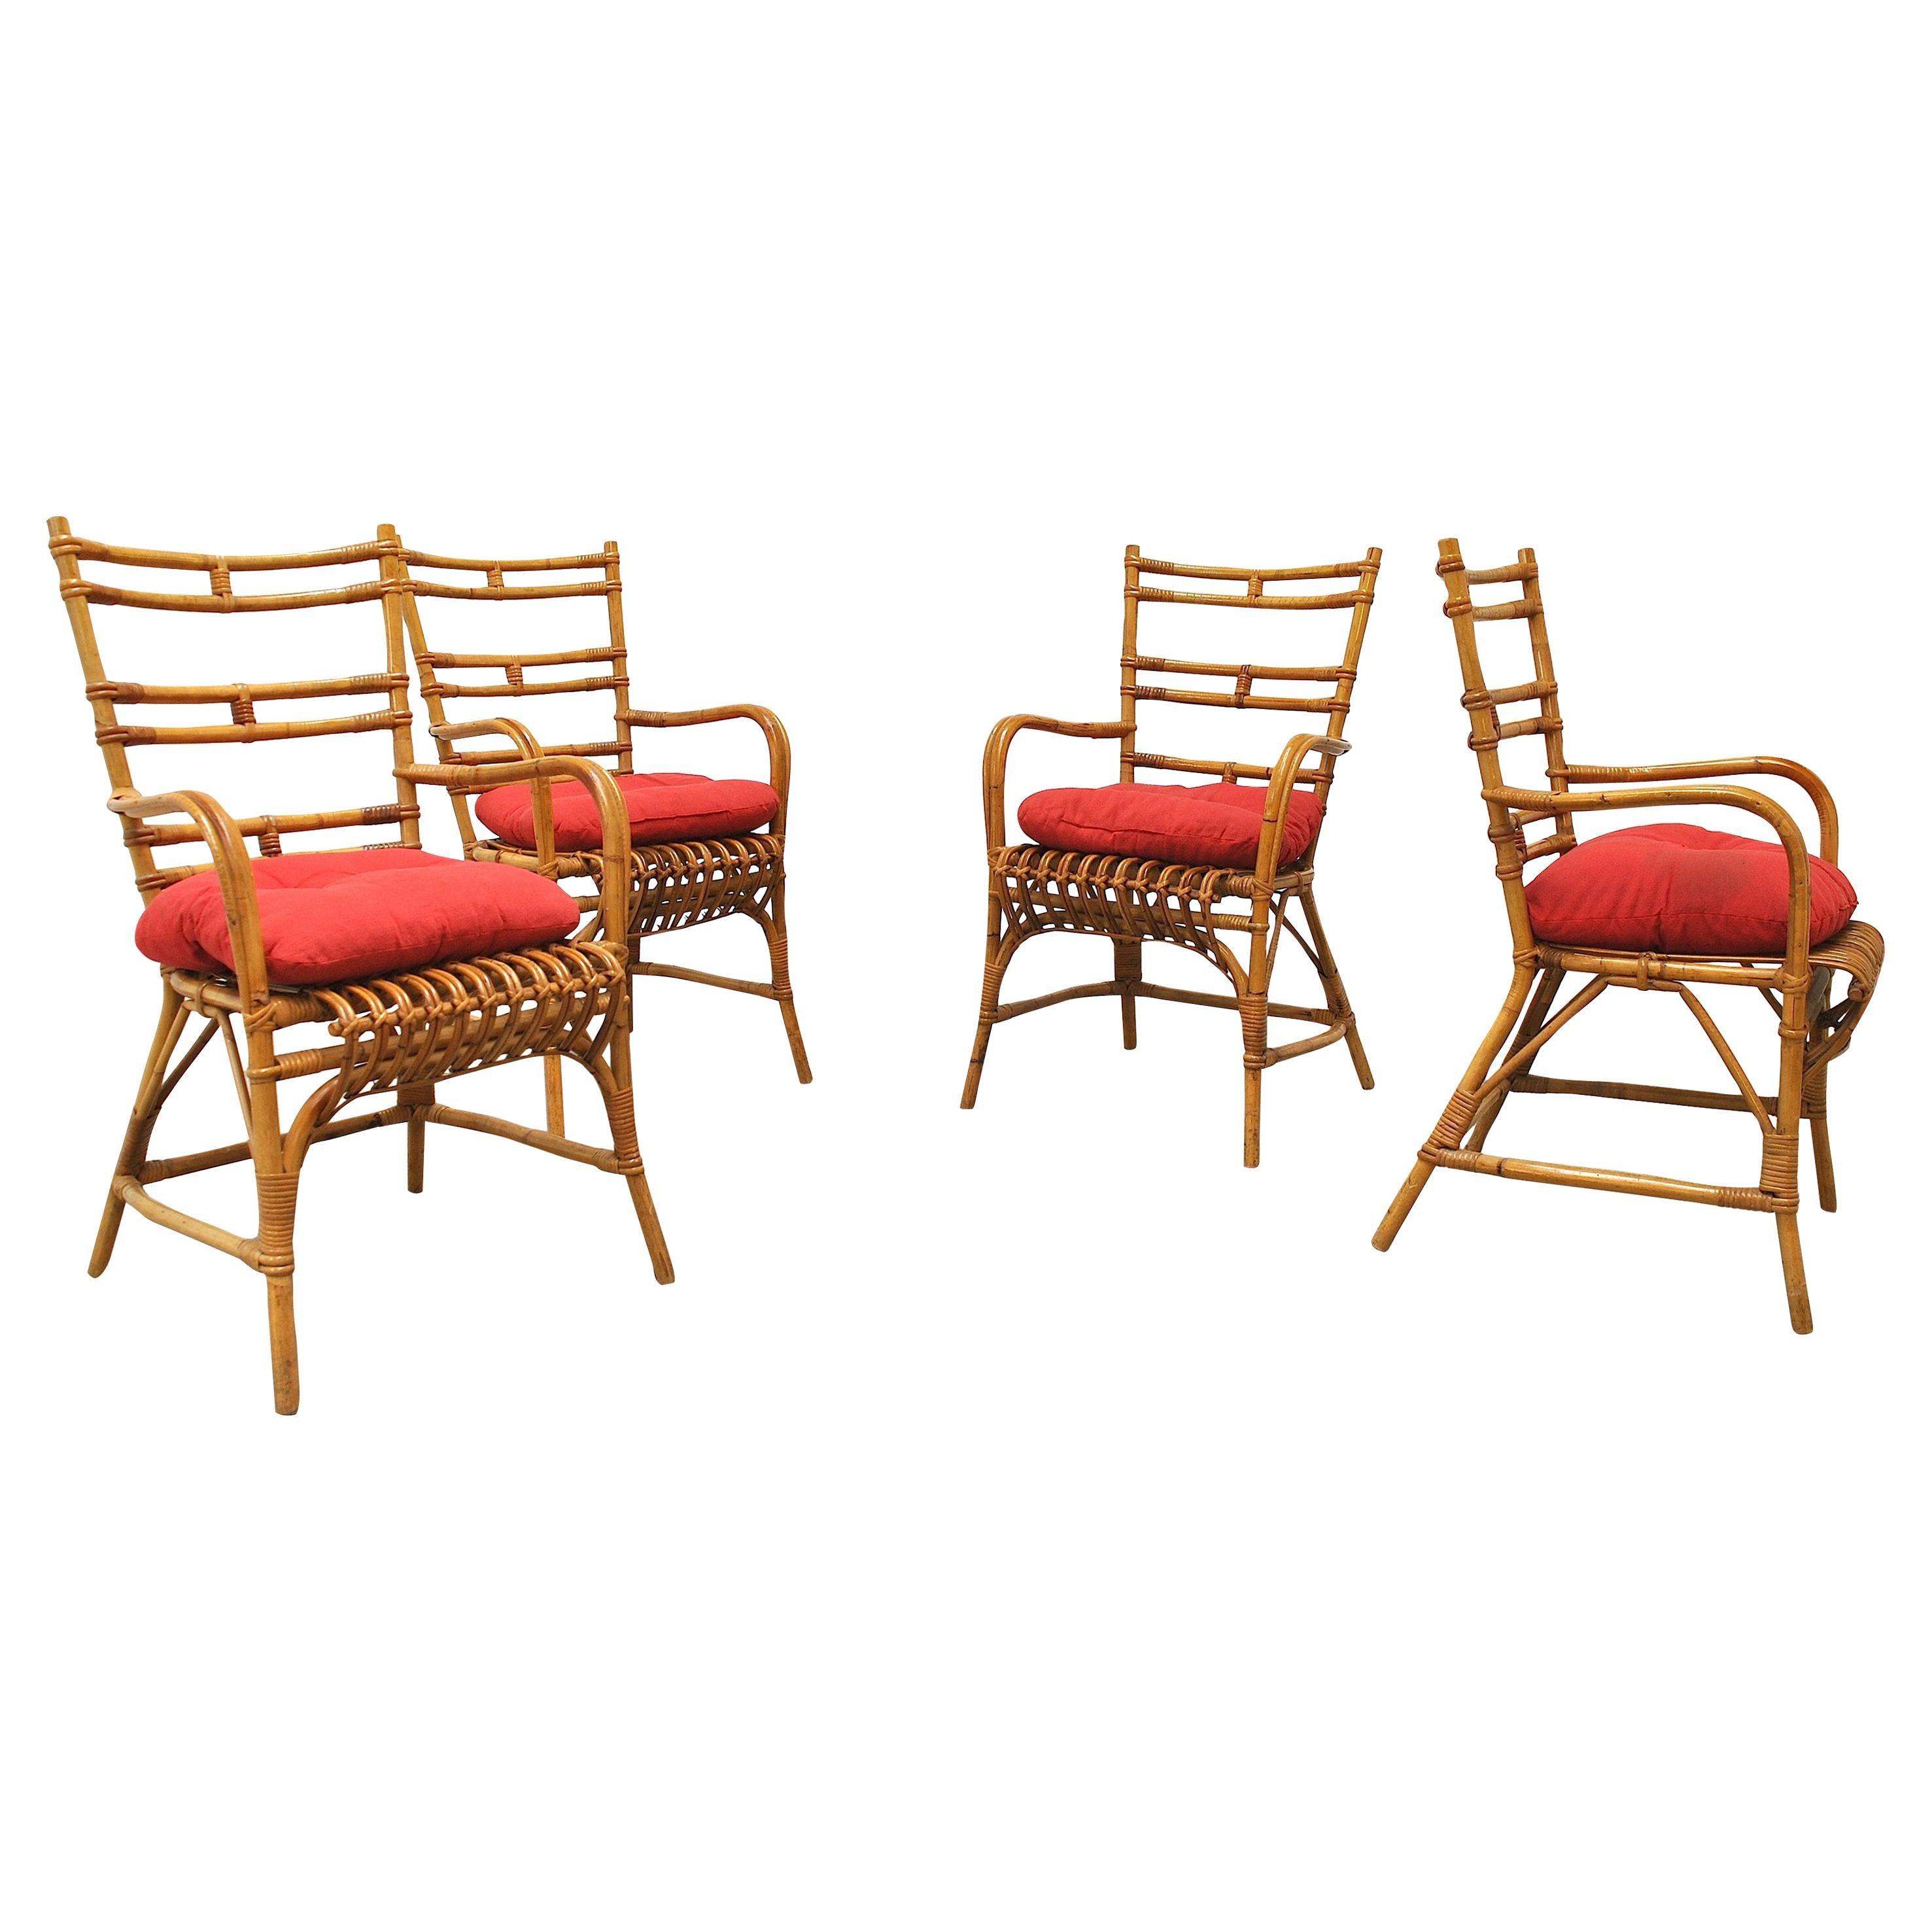 Midcentury Italian Chairs in Bambù, 1960s